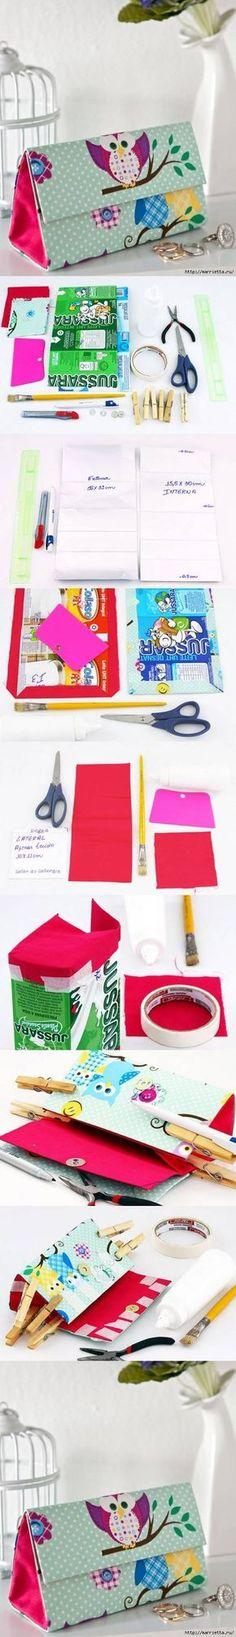 DIY Milk Box Clutch Handbag DIY Projects / UsefulDIY.com on imgfave